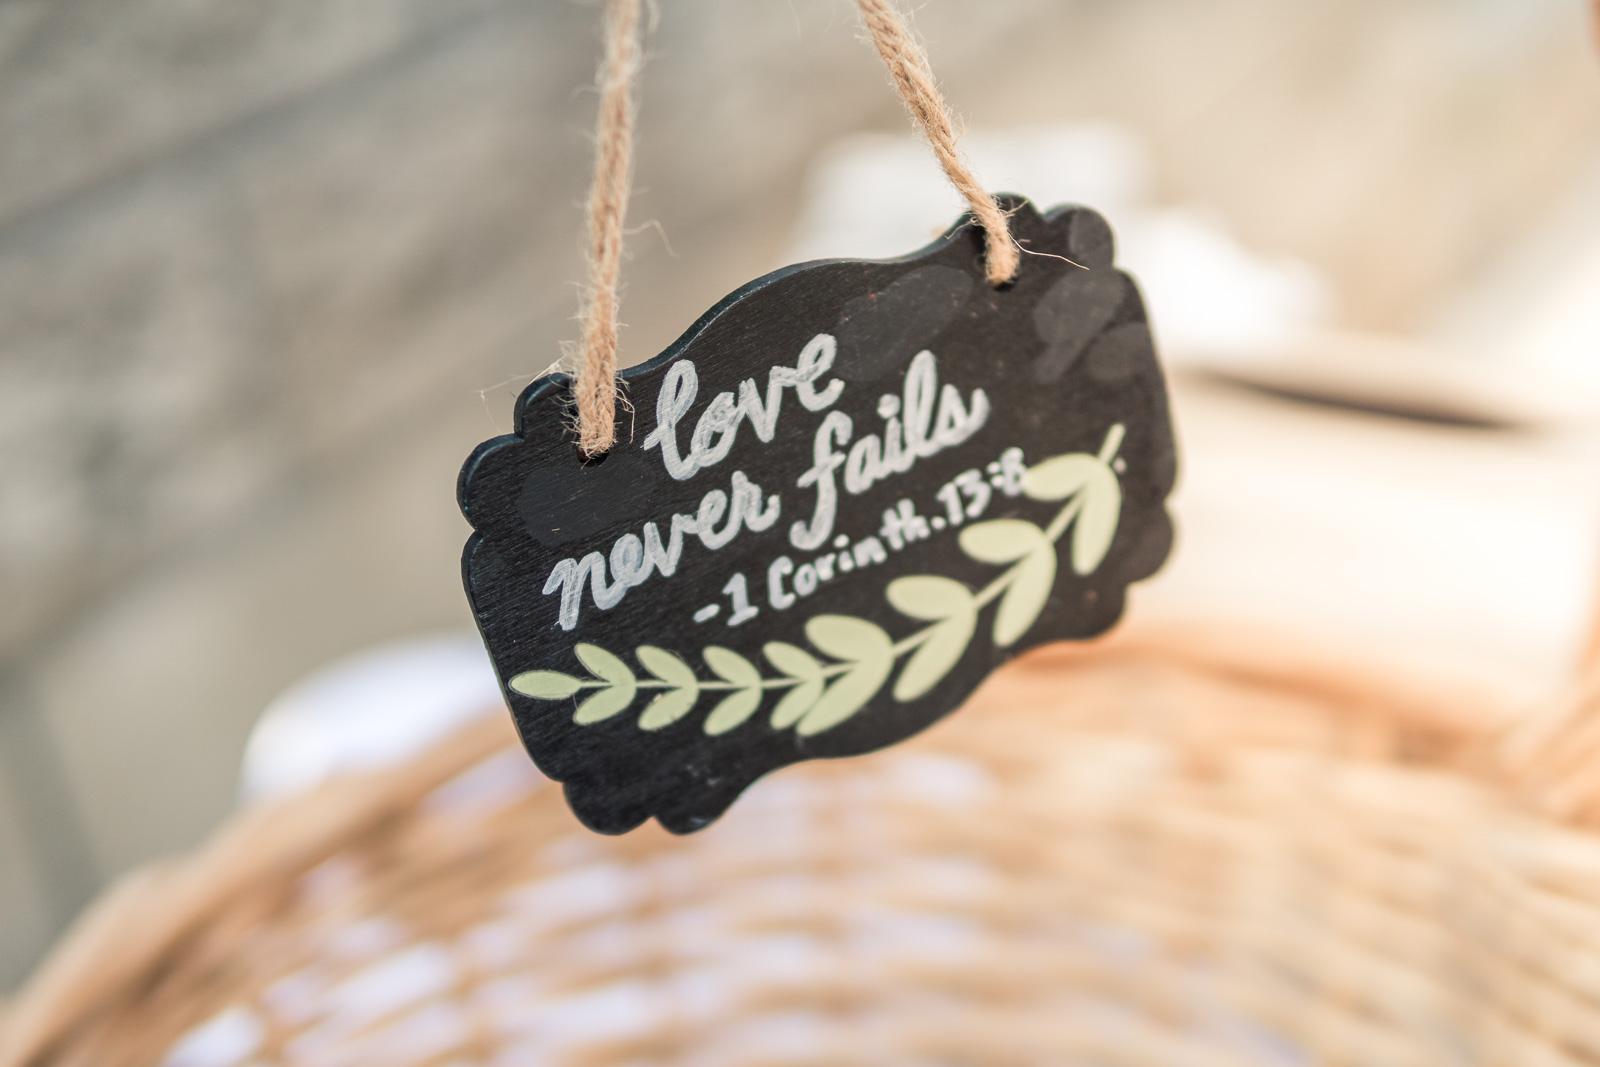 105_Angel-Brea-Orange-County_Joseph-Barber-Wedding-Photography.jpg